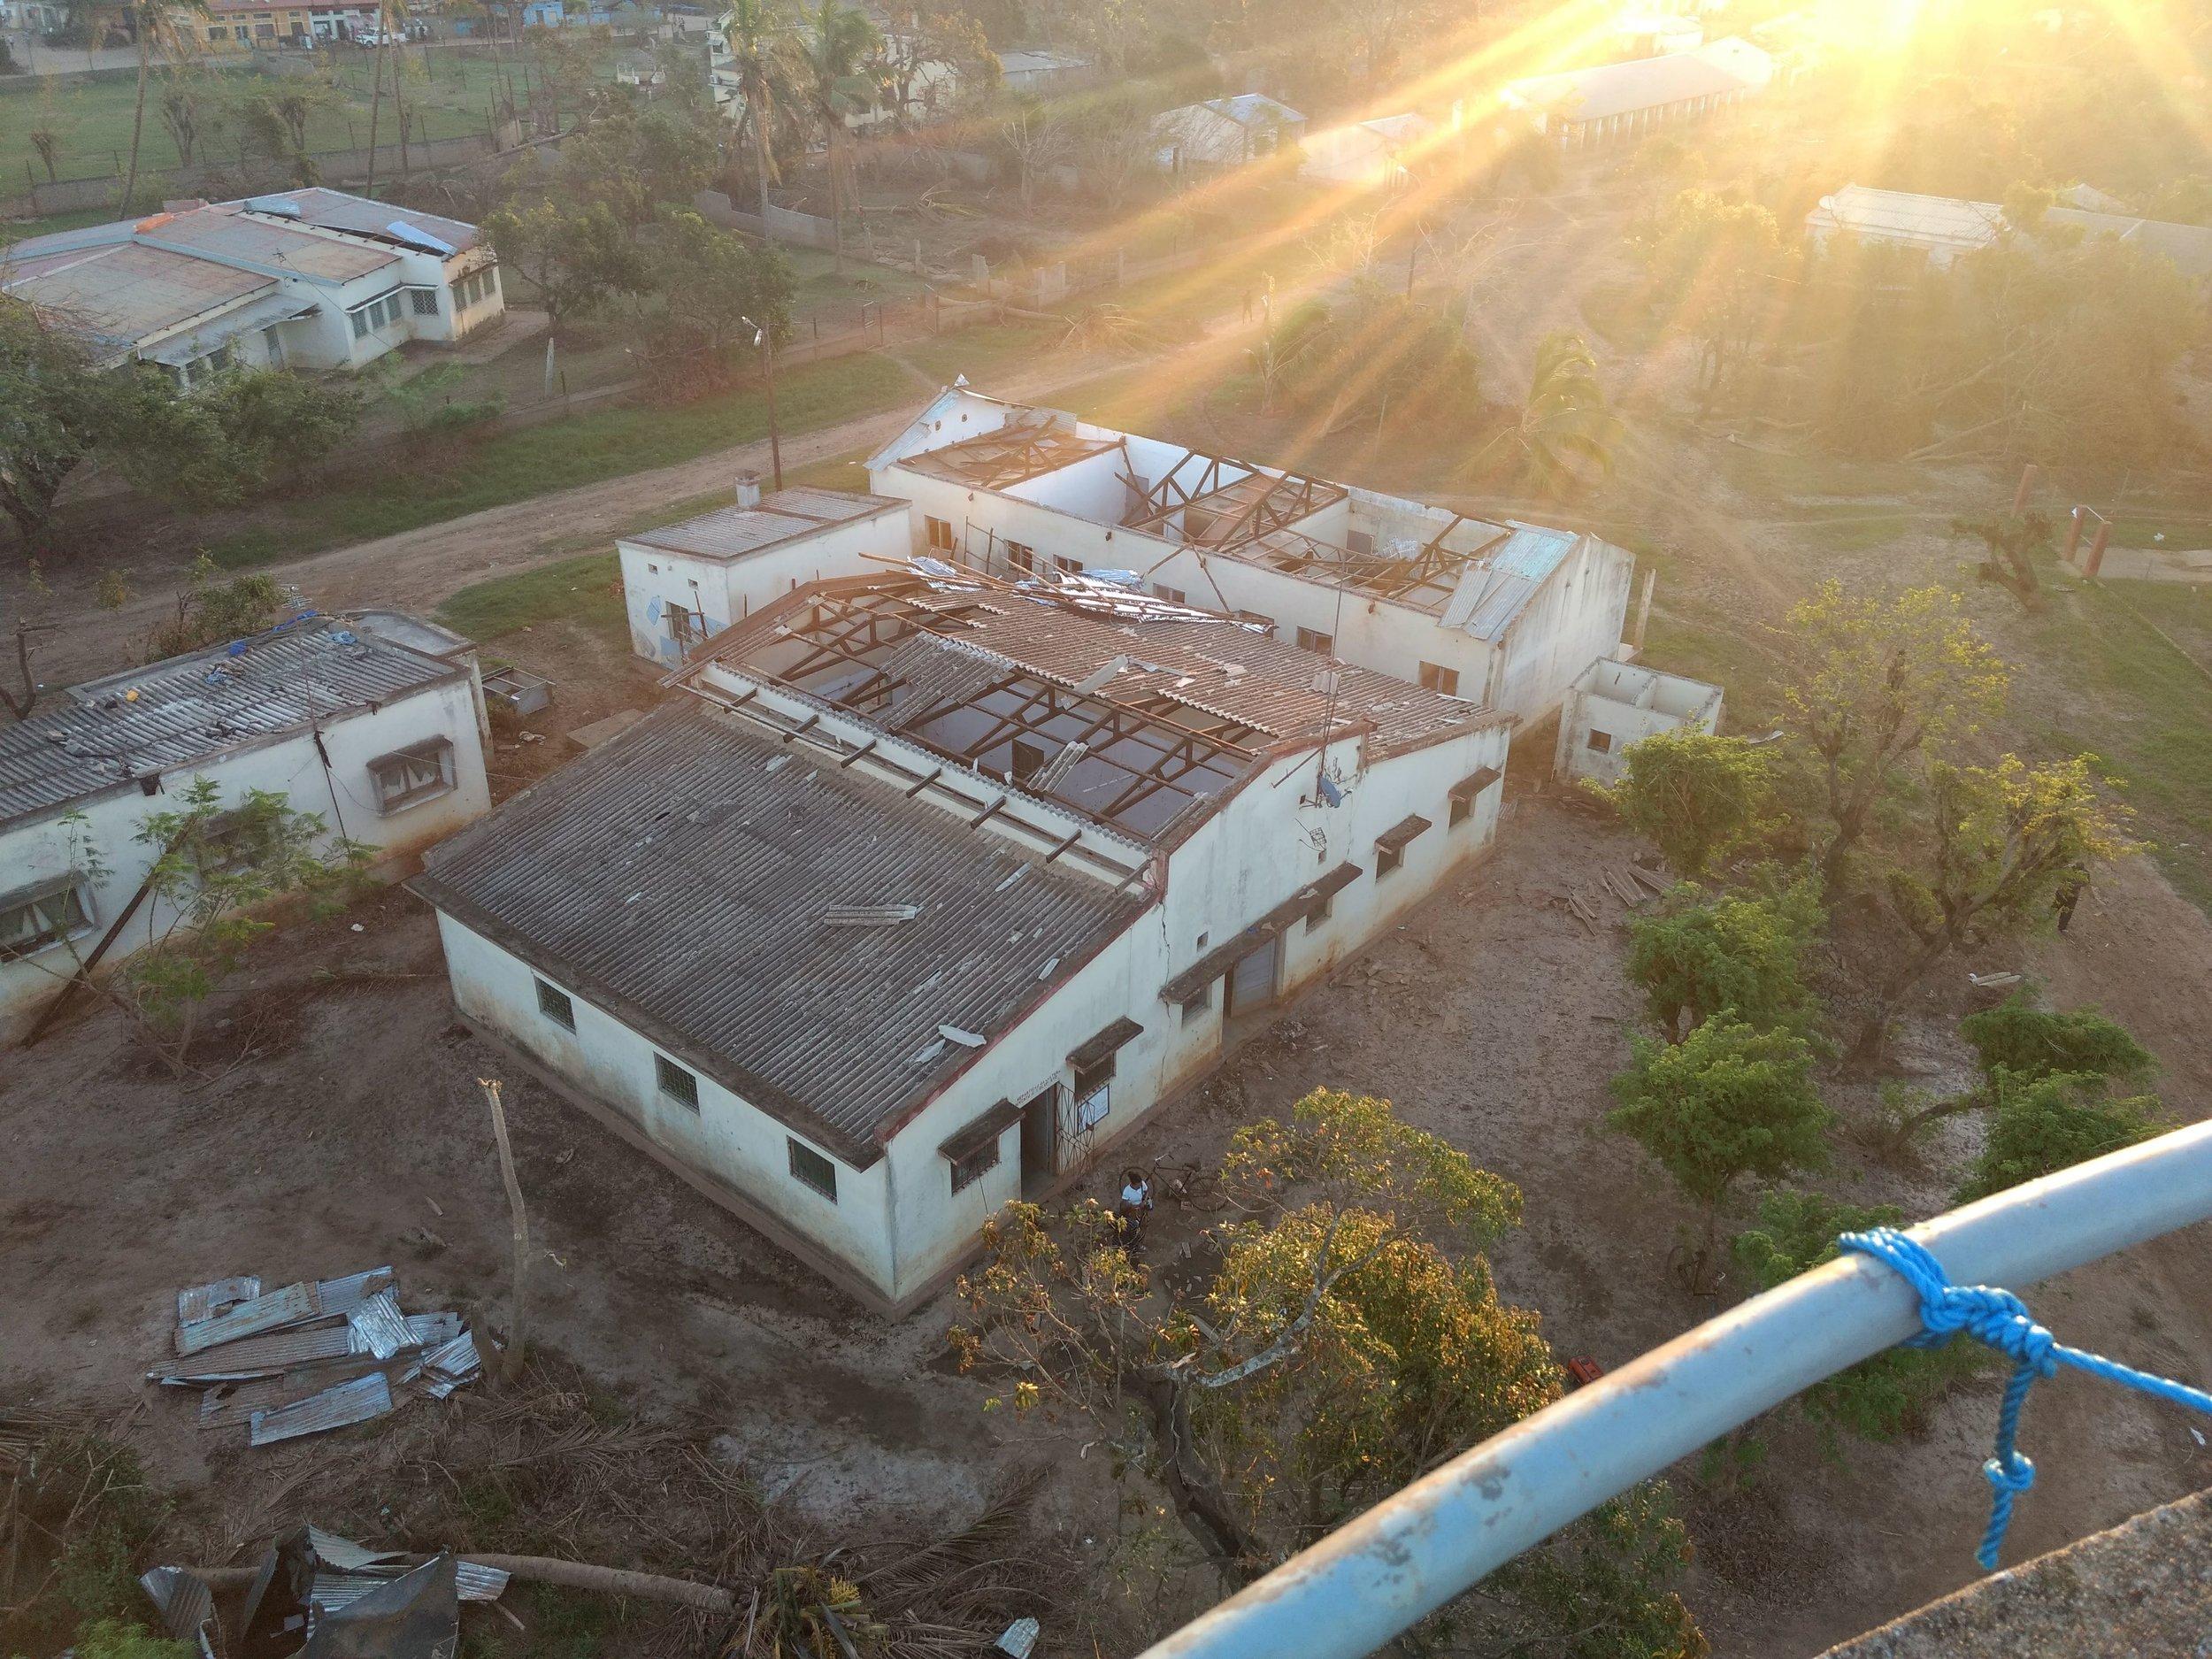 Storm damaged cultural centre provides temporary studio location for Buzi FM, March 2019.